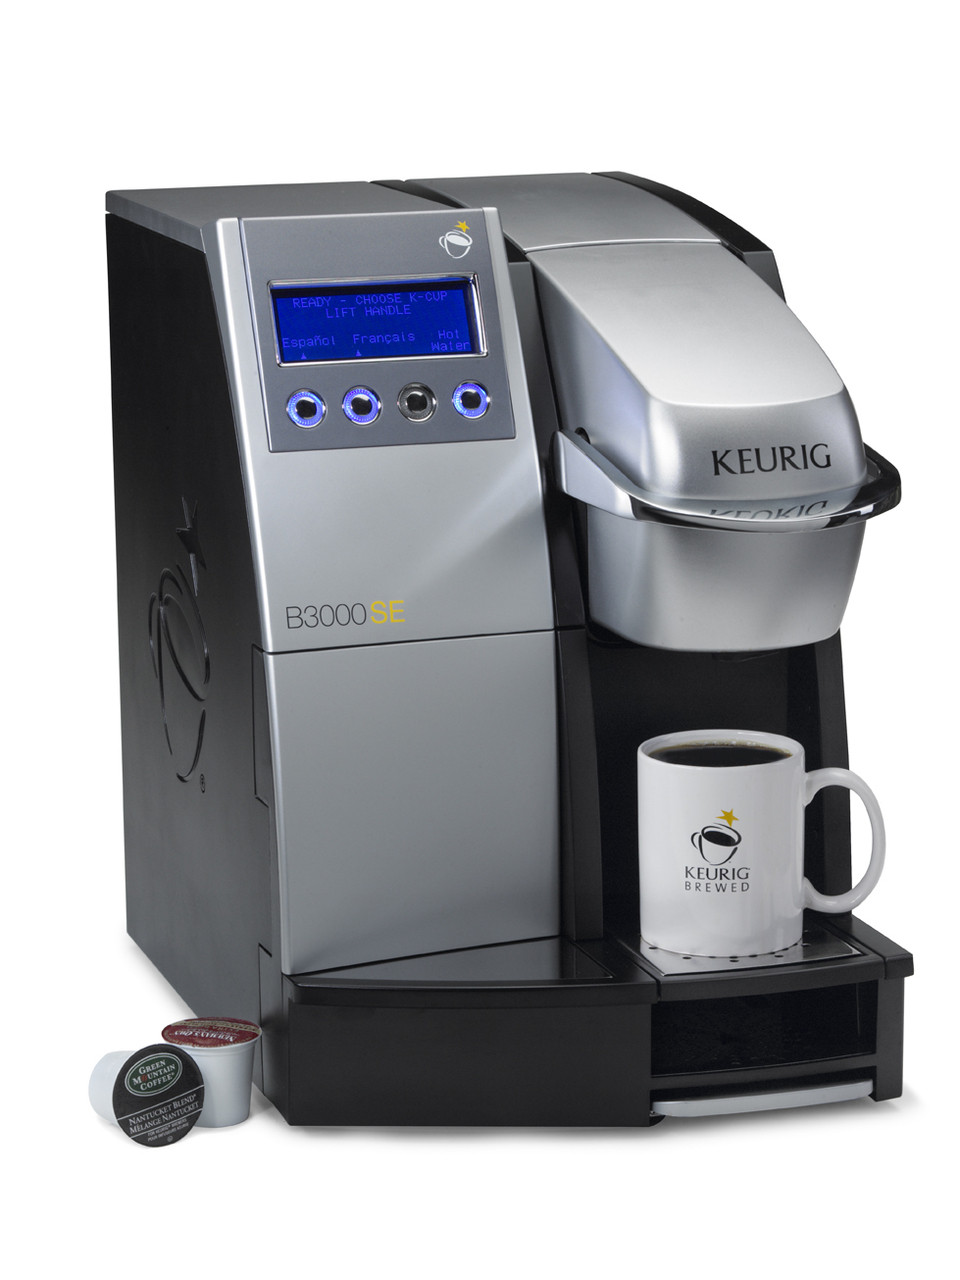 Keurig K3000 Commercial Single Cup Brewer